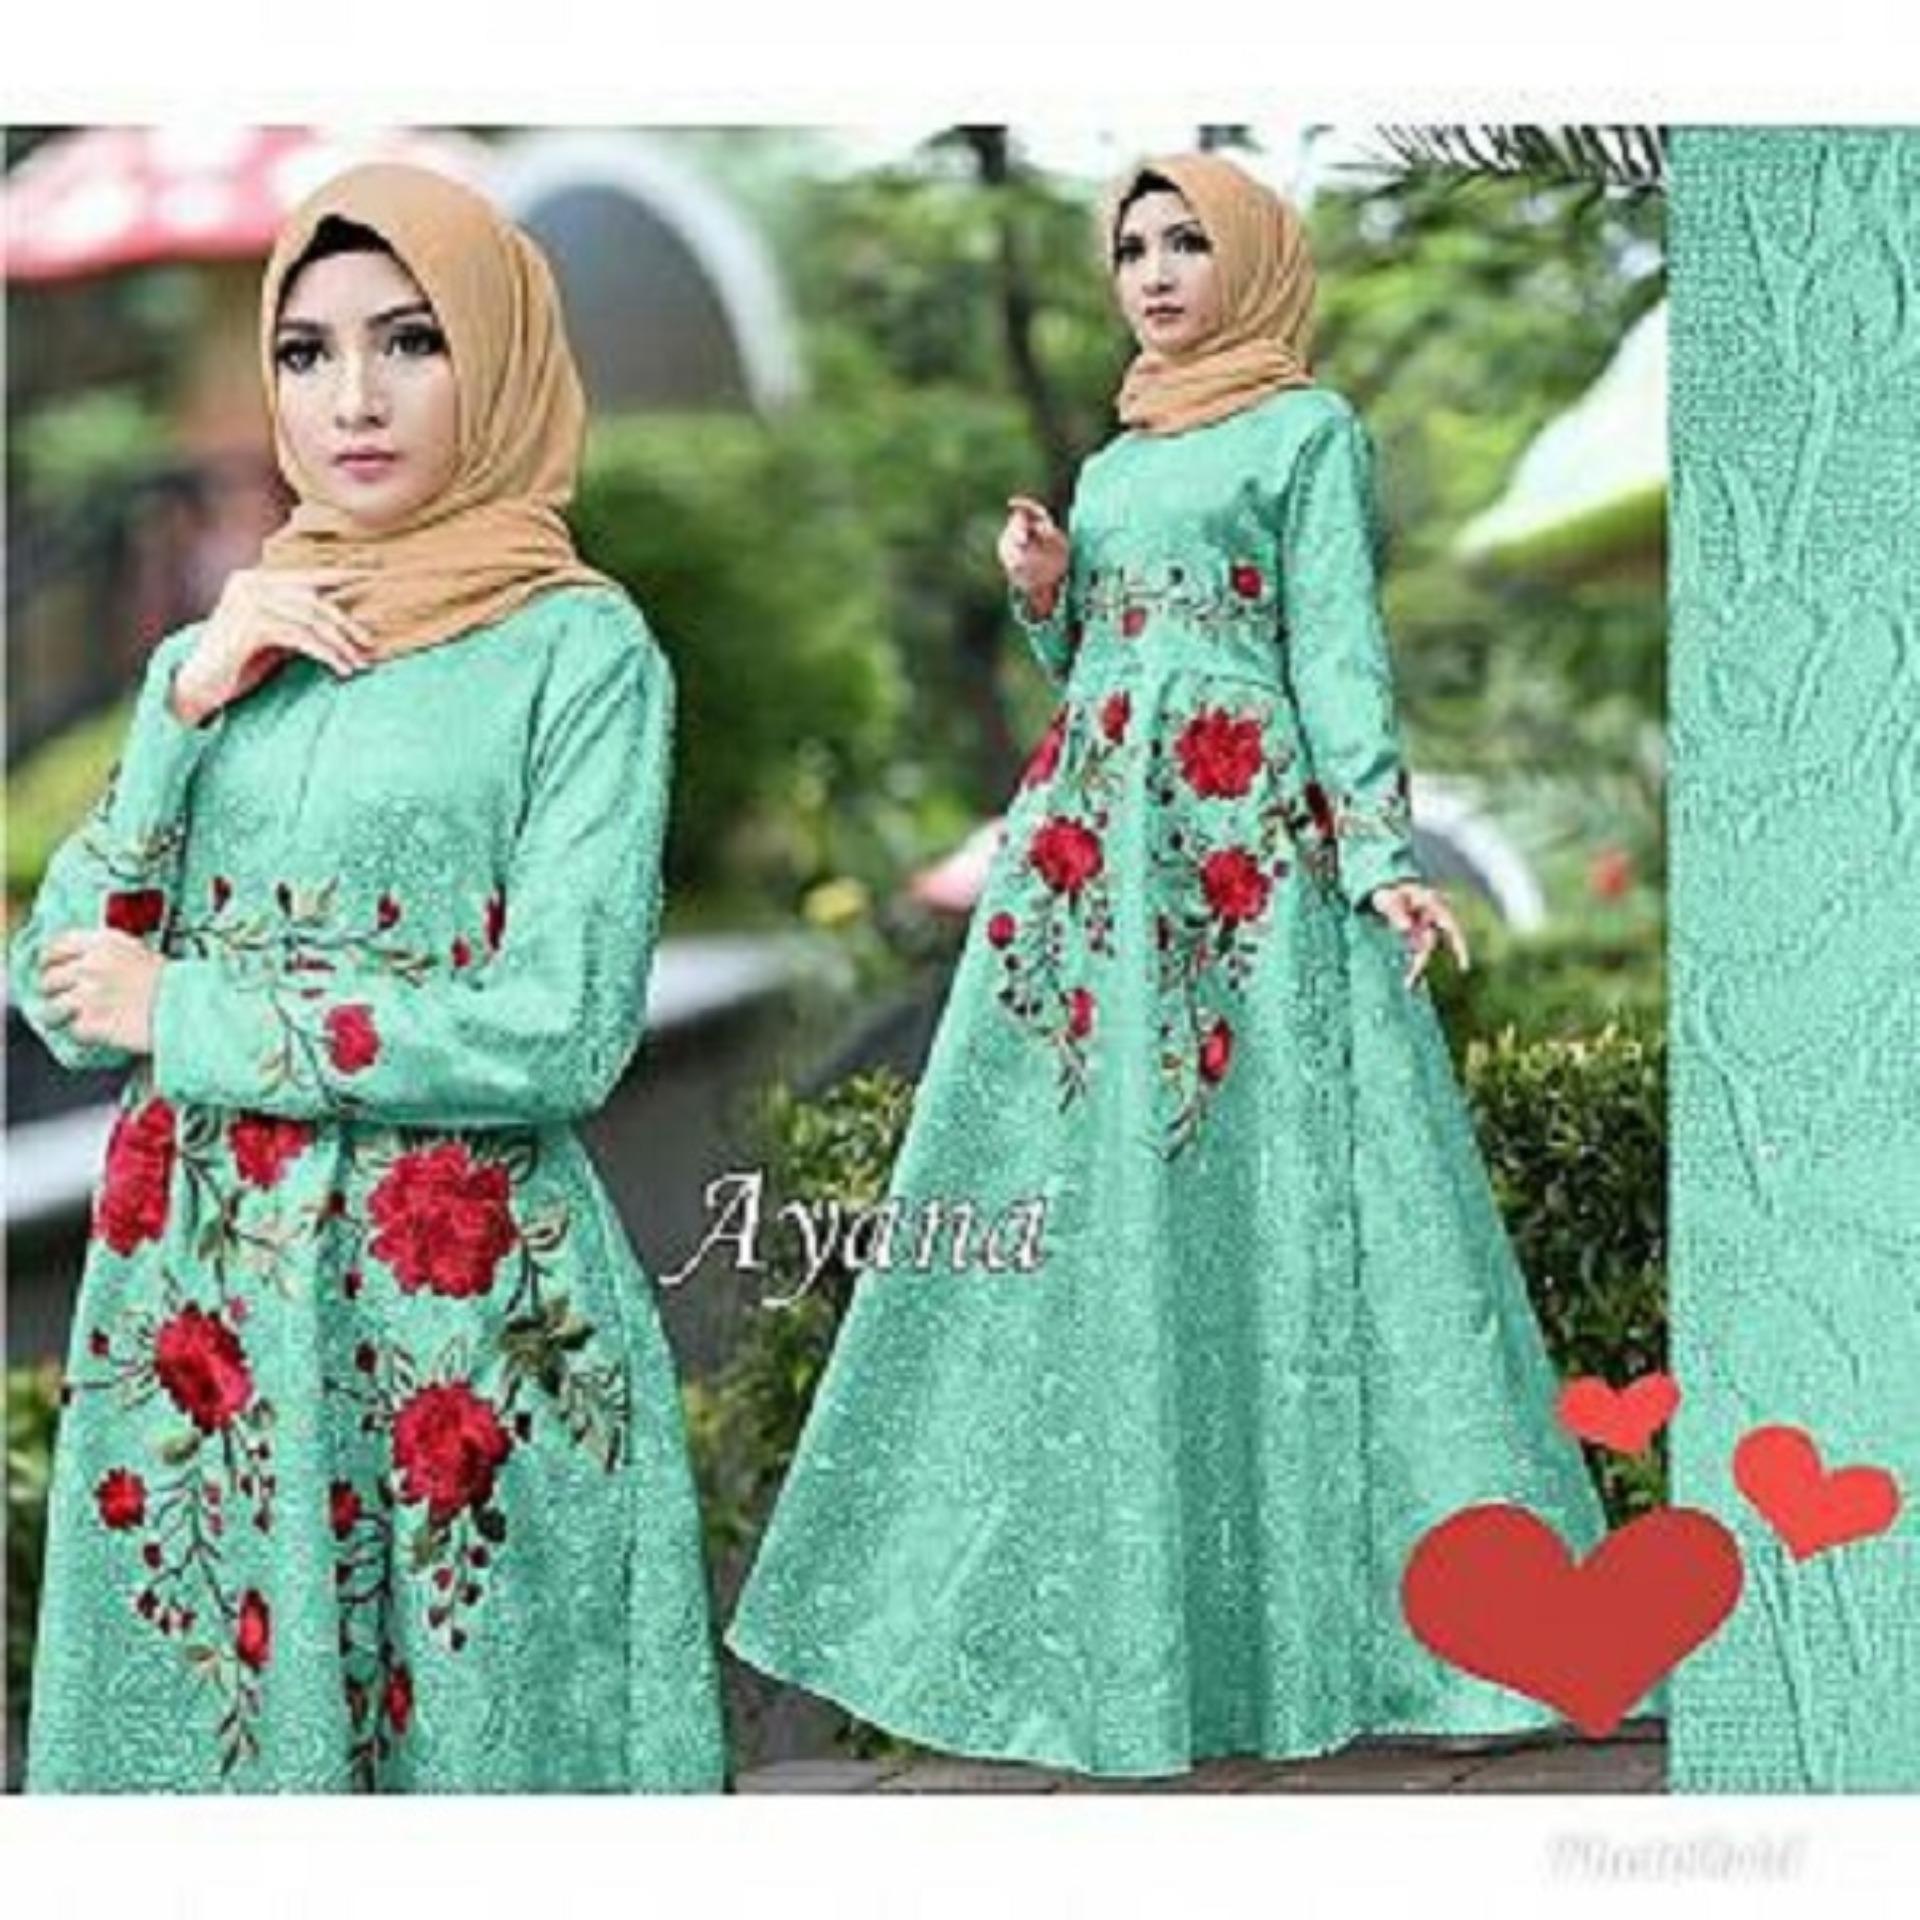 Buy Sell Cheapest Gamis Maxi Best Quality Product Deals Emma 23 Baju Muslim Wanita Gamia Model Kekinian Trendshopee Pakaian Ayanamoon